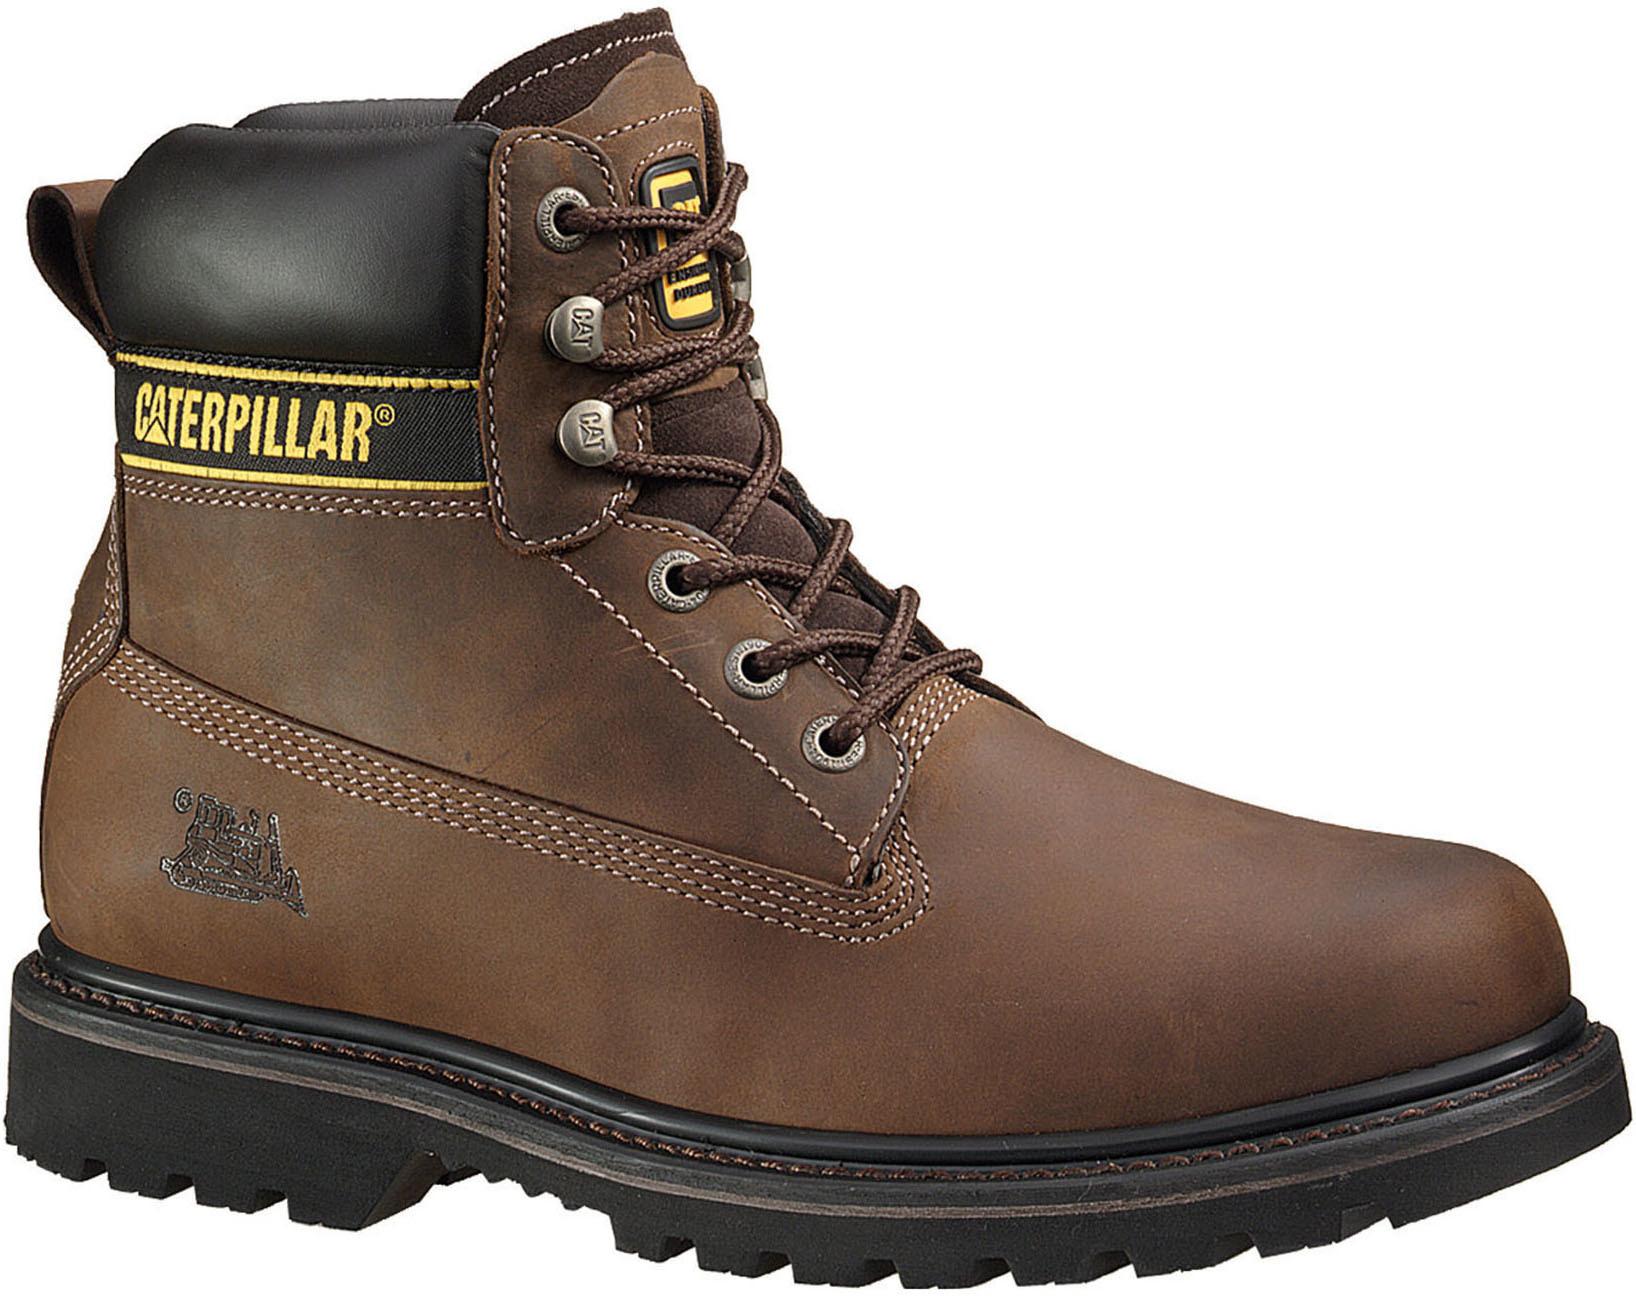 af03465c31ff29 Męskie buty robocze Caterpillar Holton ST S3 HRO SRC brązowe | Sklep ...